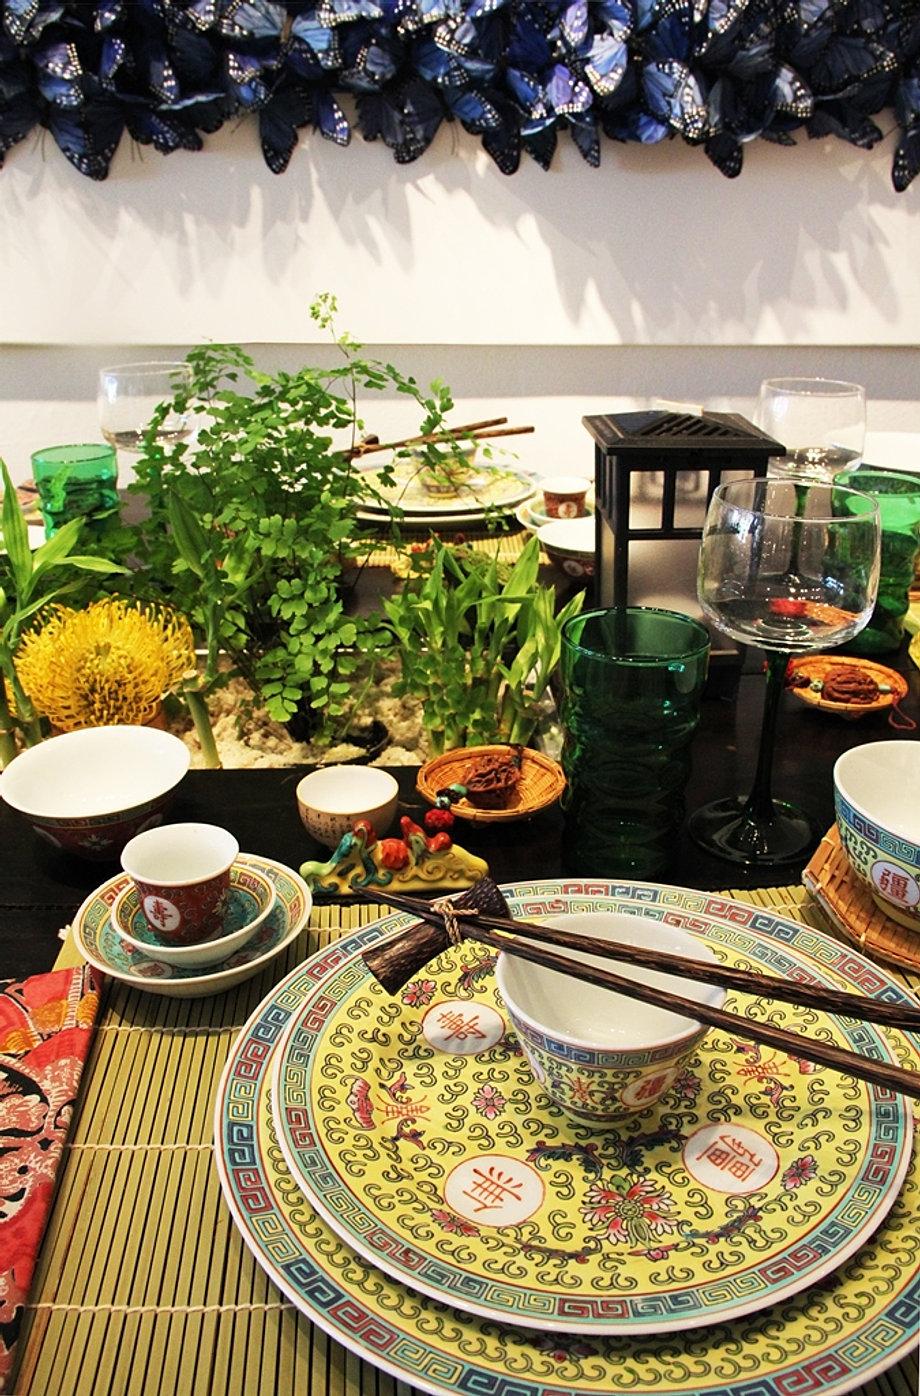 nadine kalachnikoff collection table settings